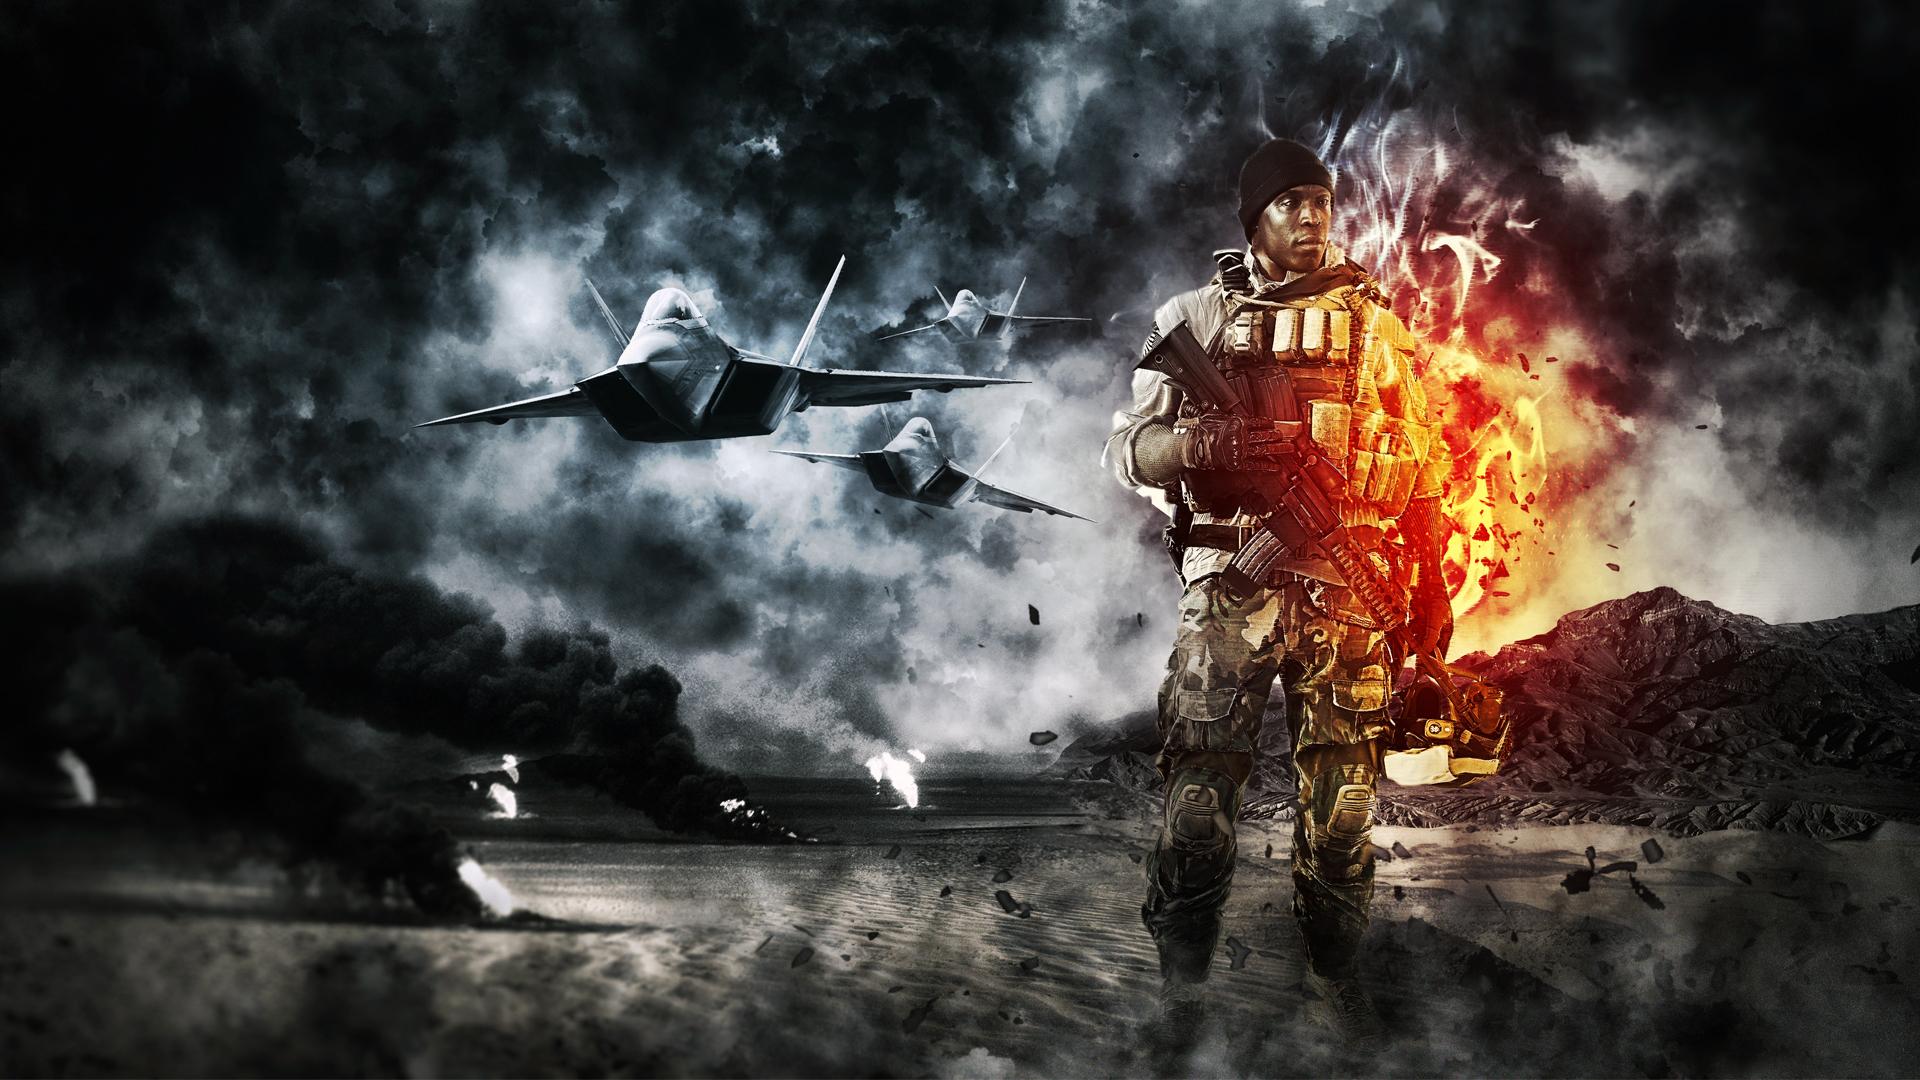 Artwork-Battlefield-I-must-admit-this-looks-sweet-wallpaper-wp3602744